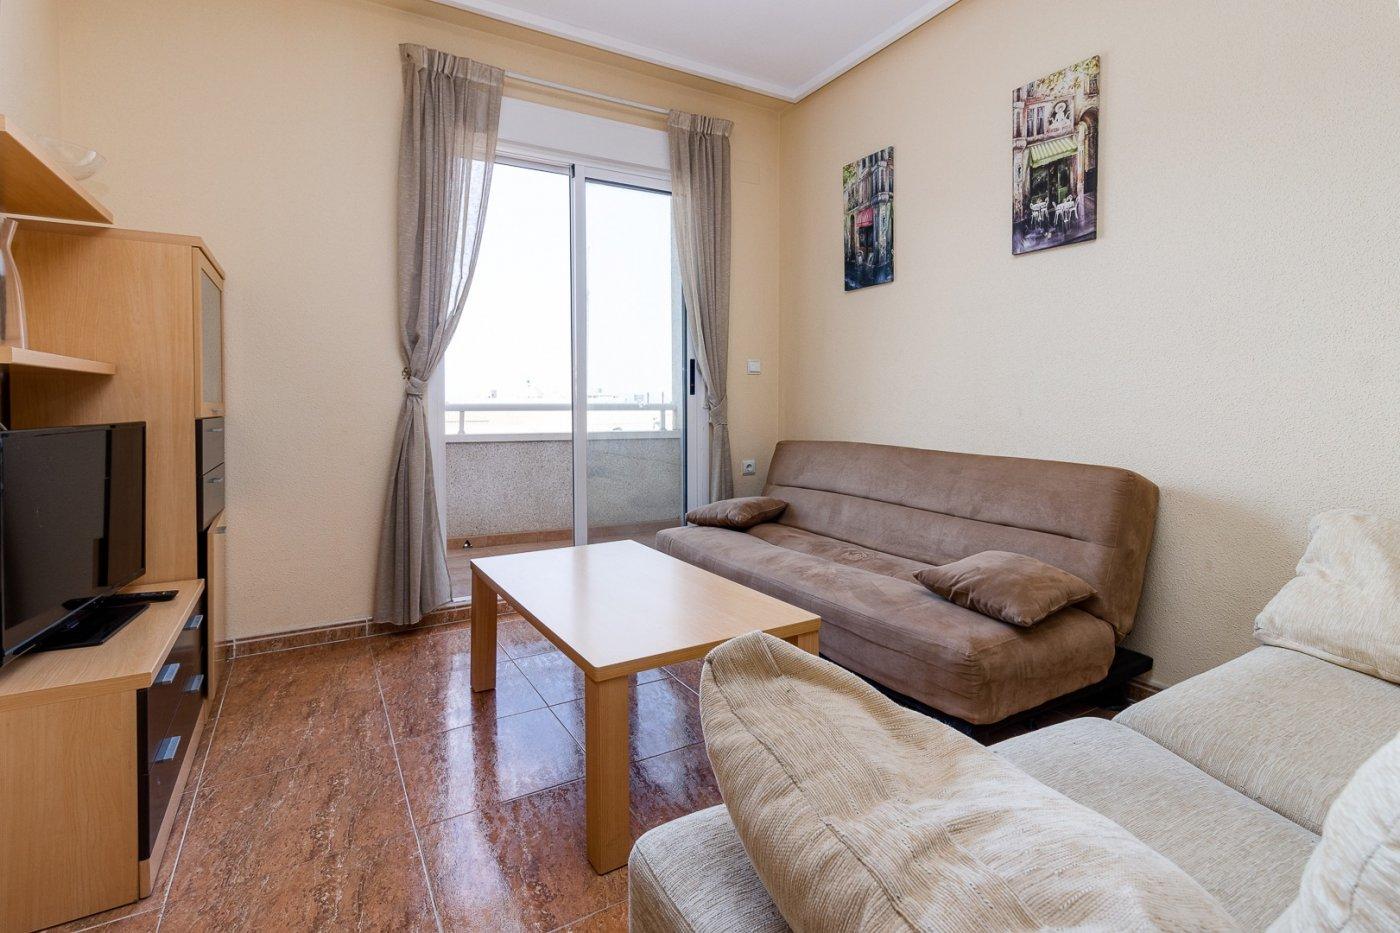 1 BEDROOM APARTMENT IN EL MOLINO, TOREVIEJA